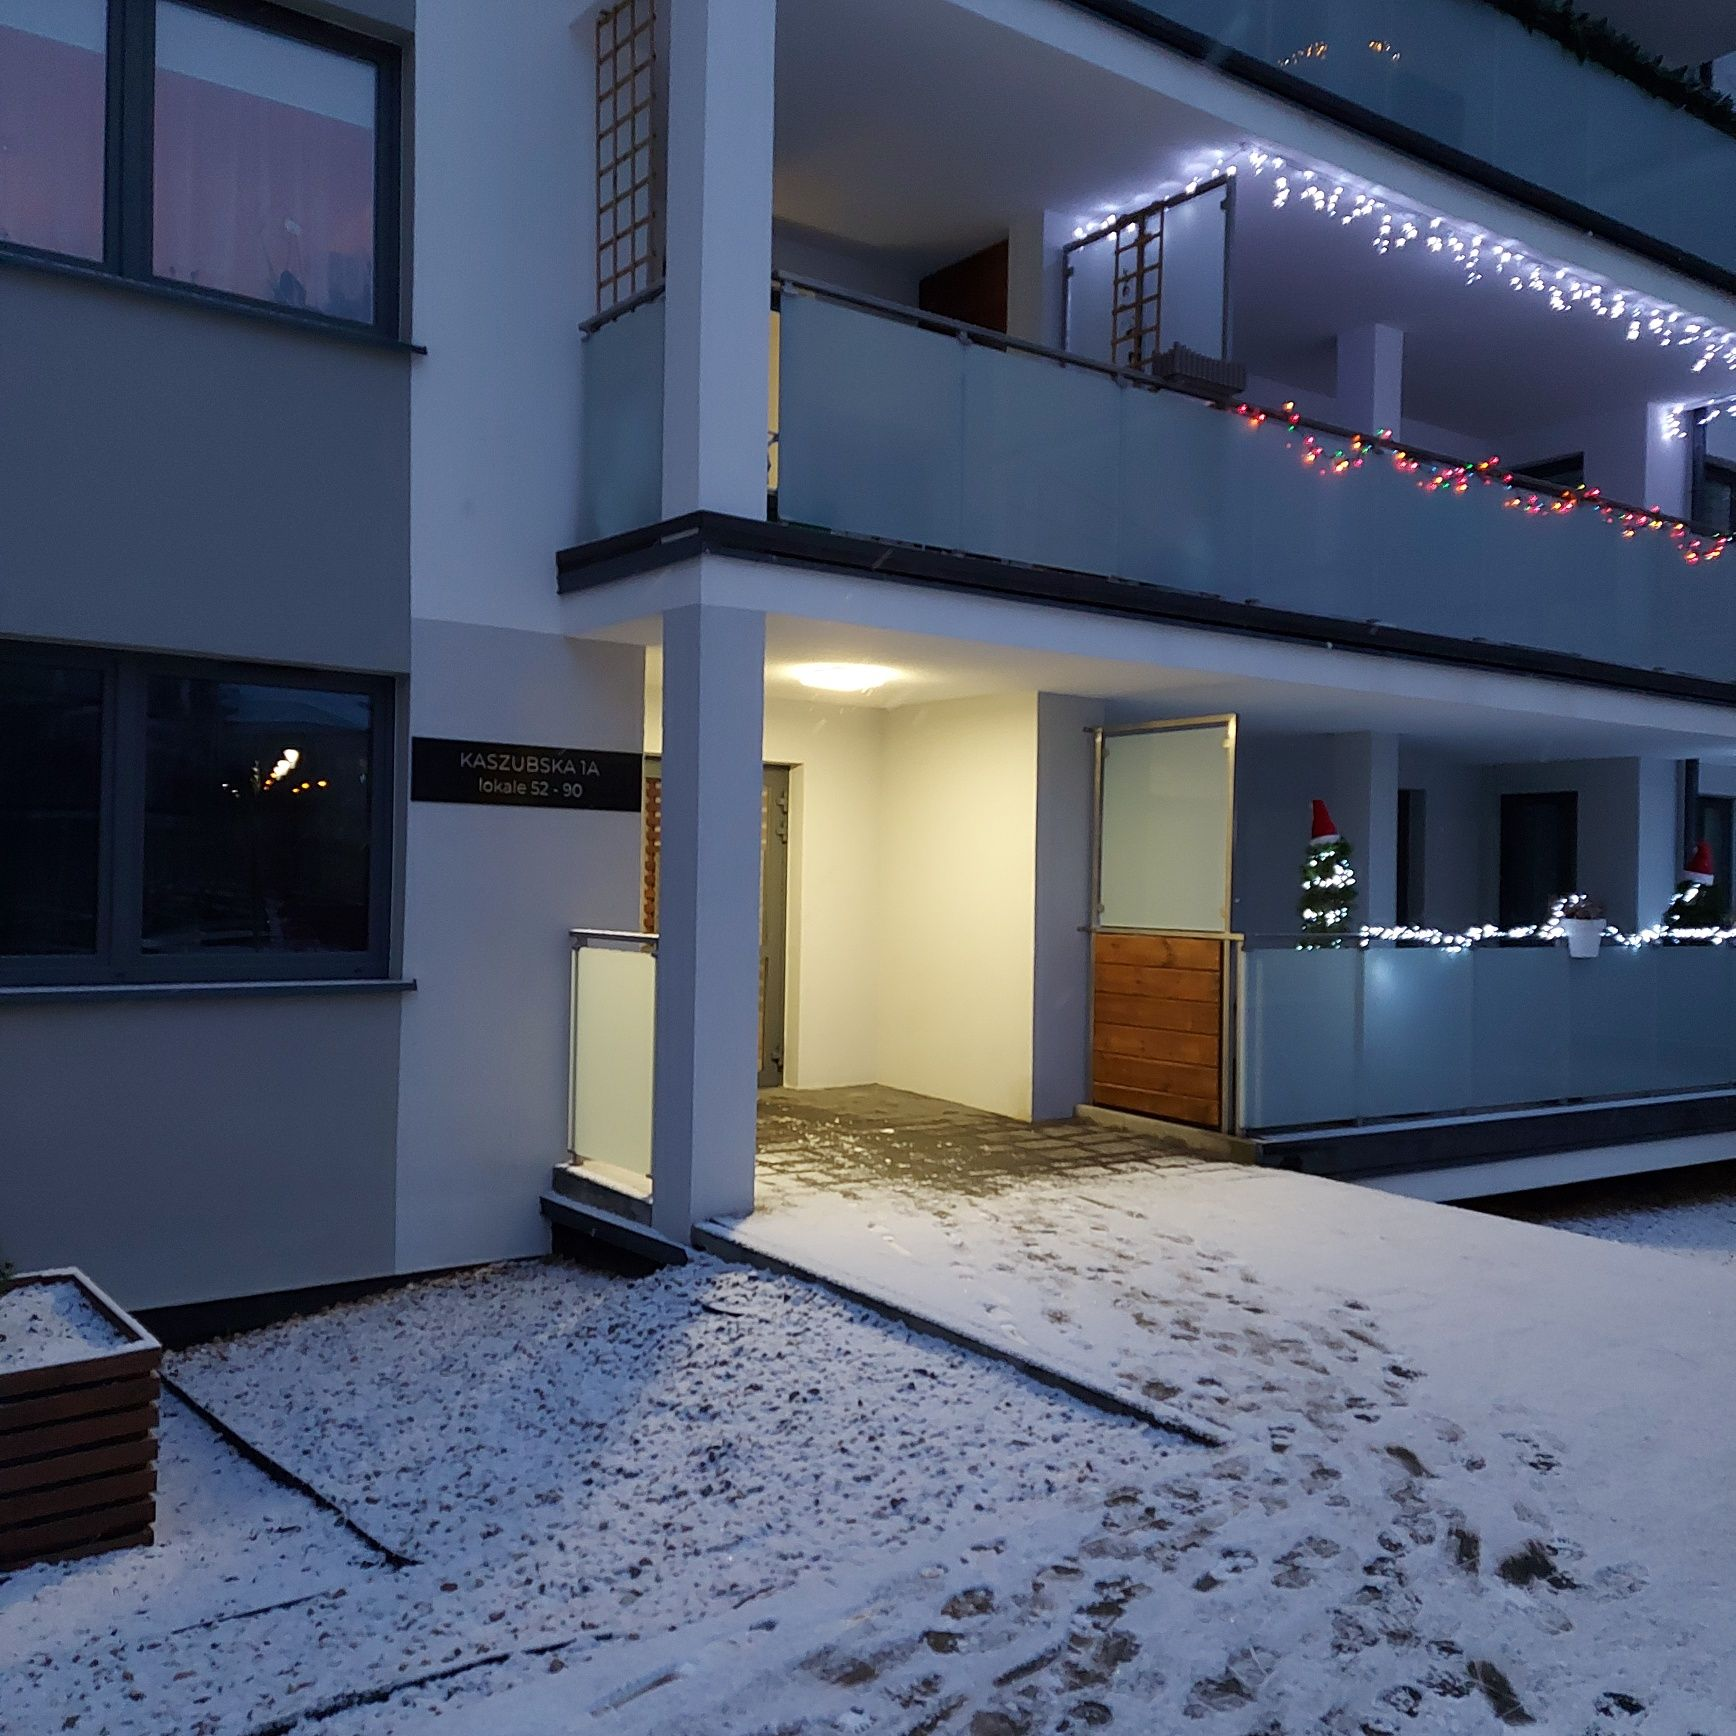 Apartament na doby